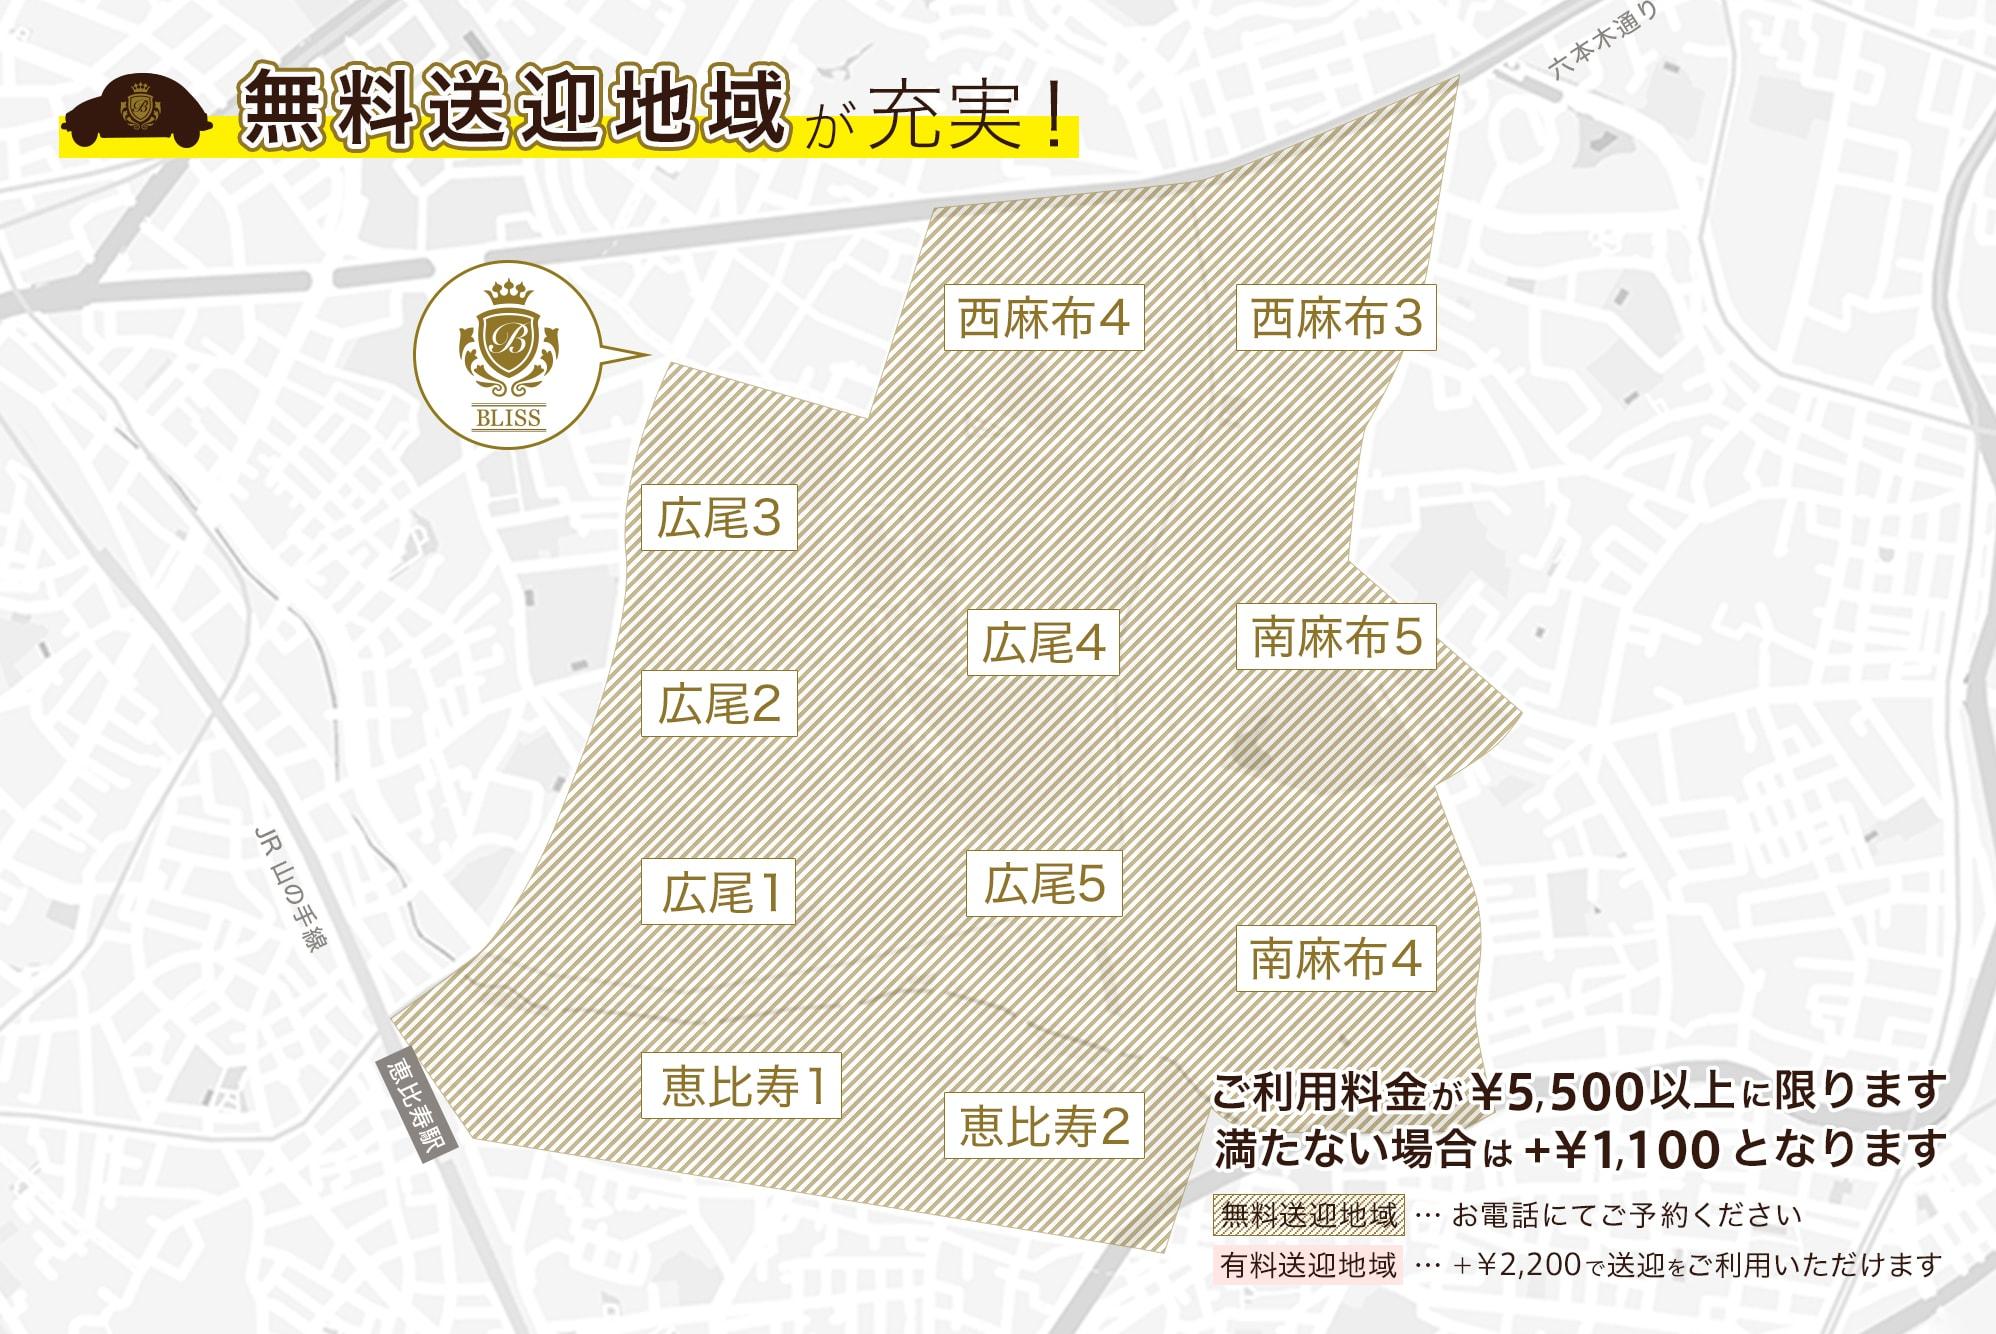 無料送迎地域【広尾エリア】